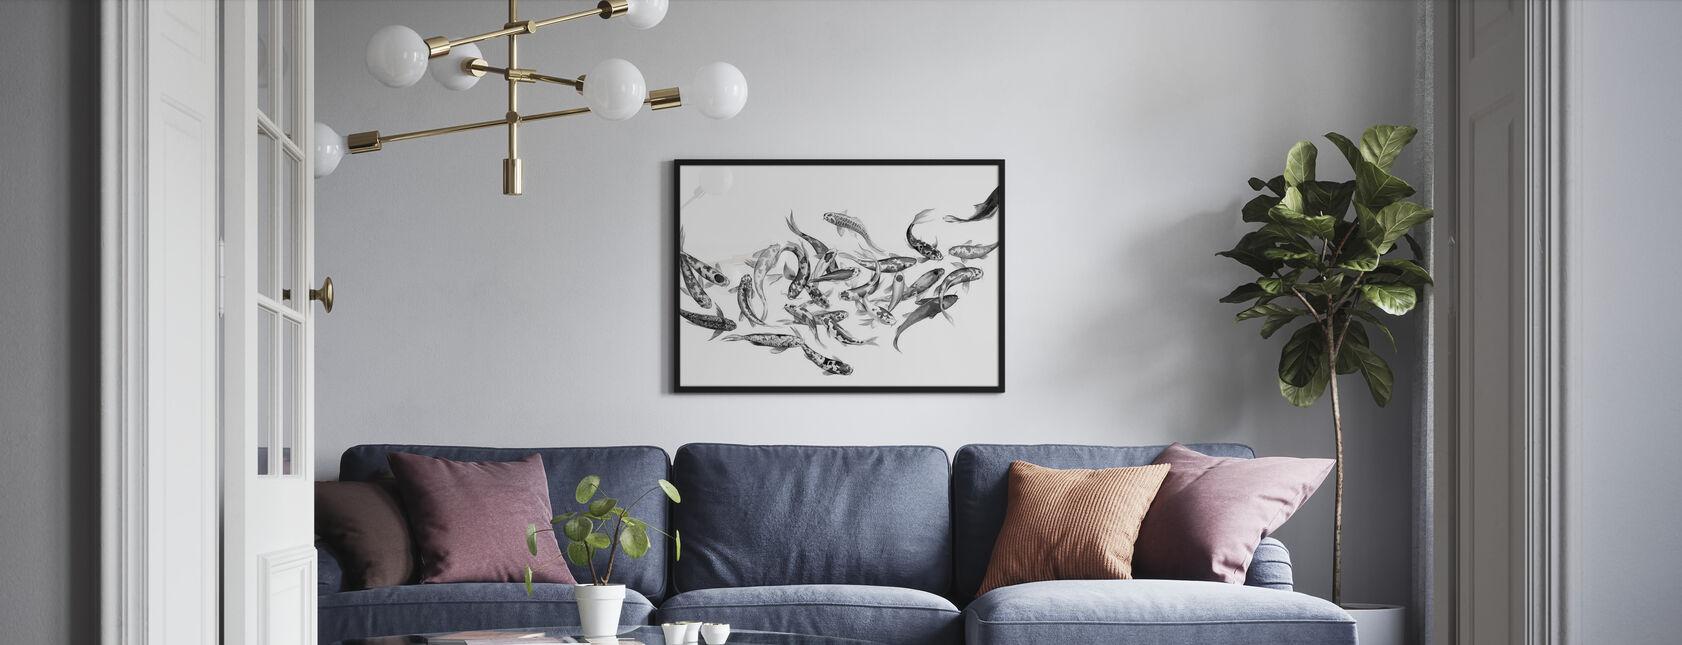 Koi Fishes - Poster - Living Room